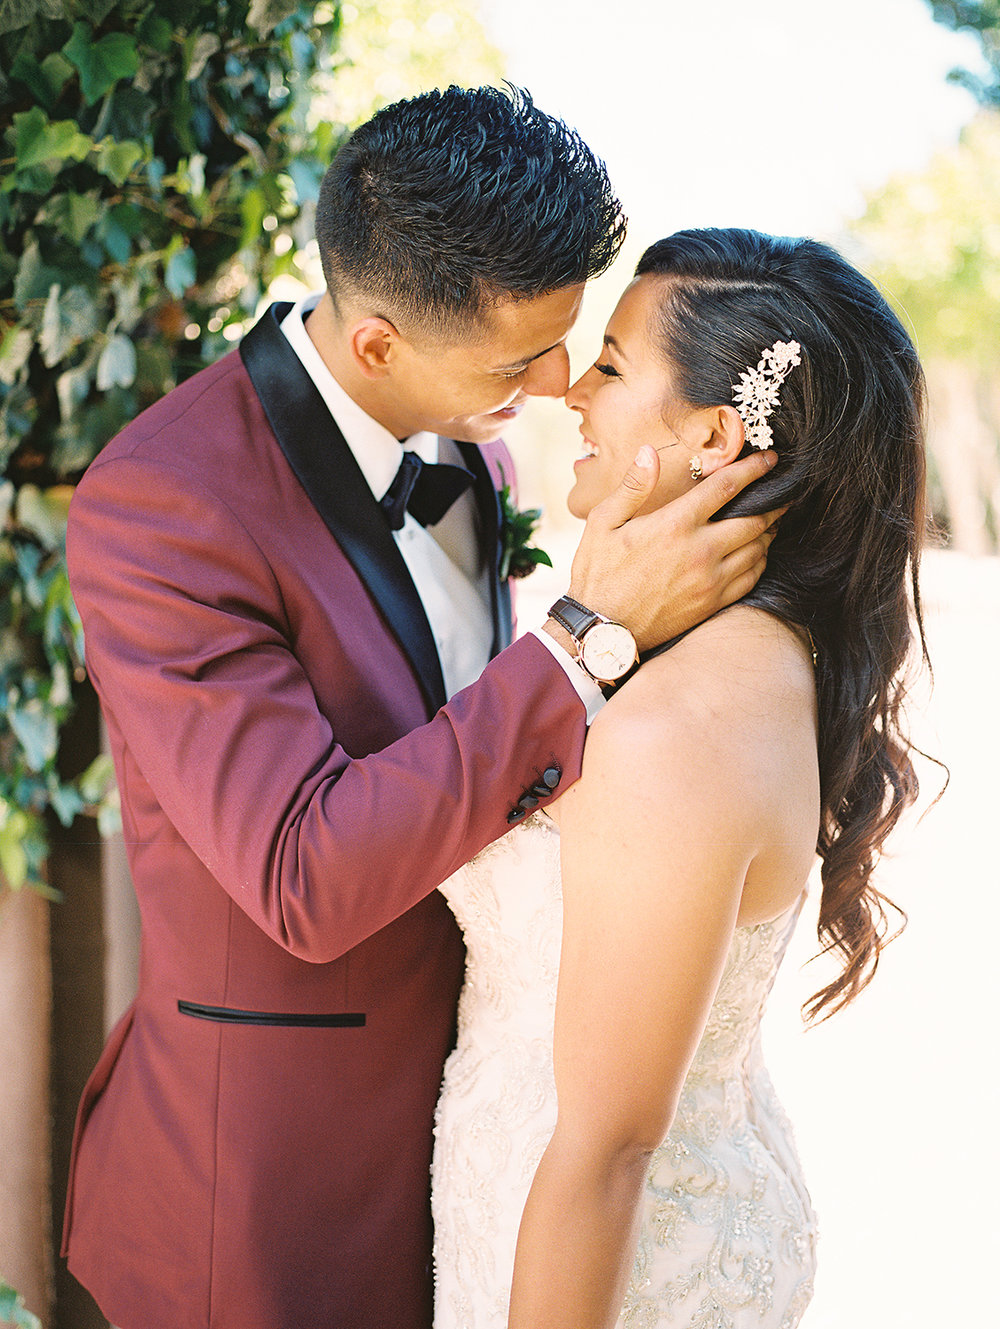 albuquerque-new-mexico-wedding-photographer-skylar-rain-photography-a-g-9.jpg